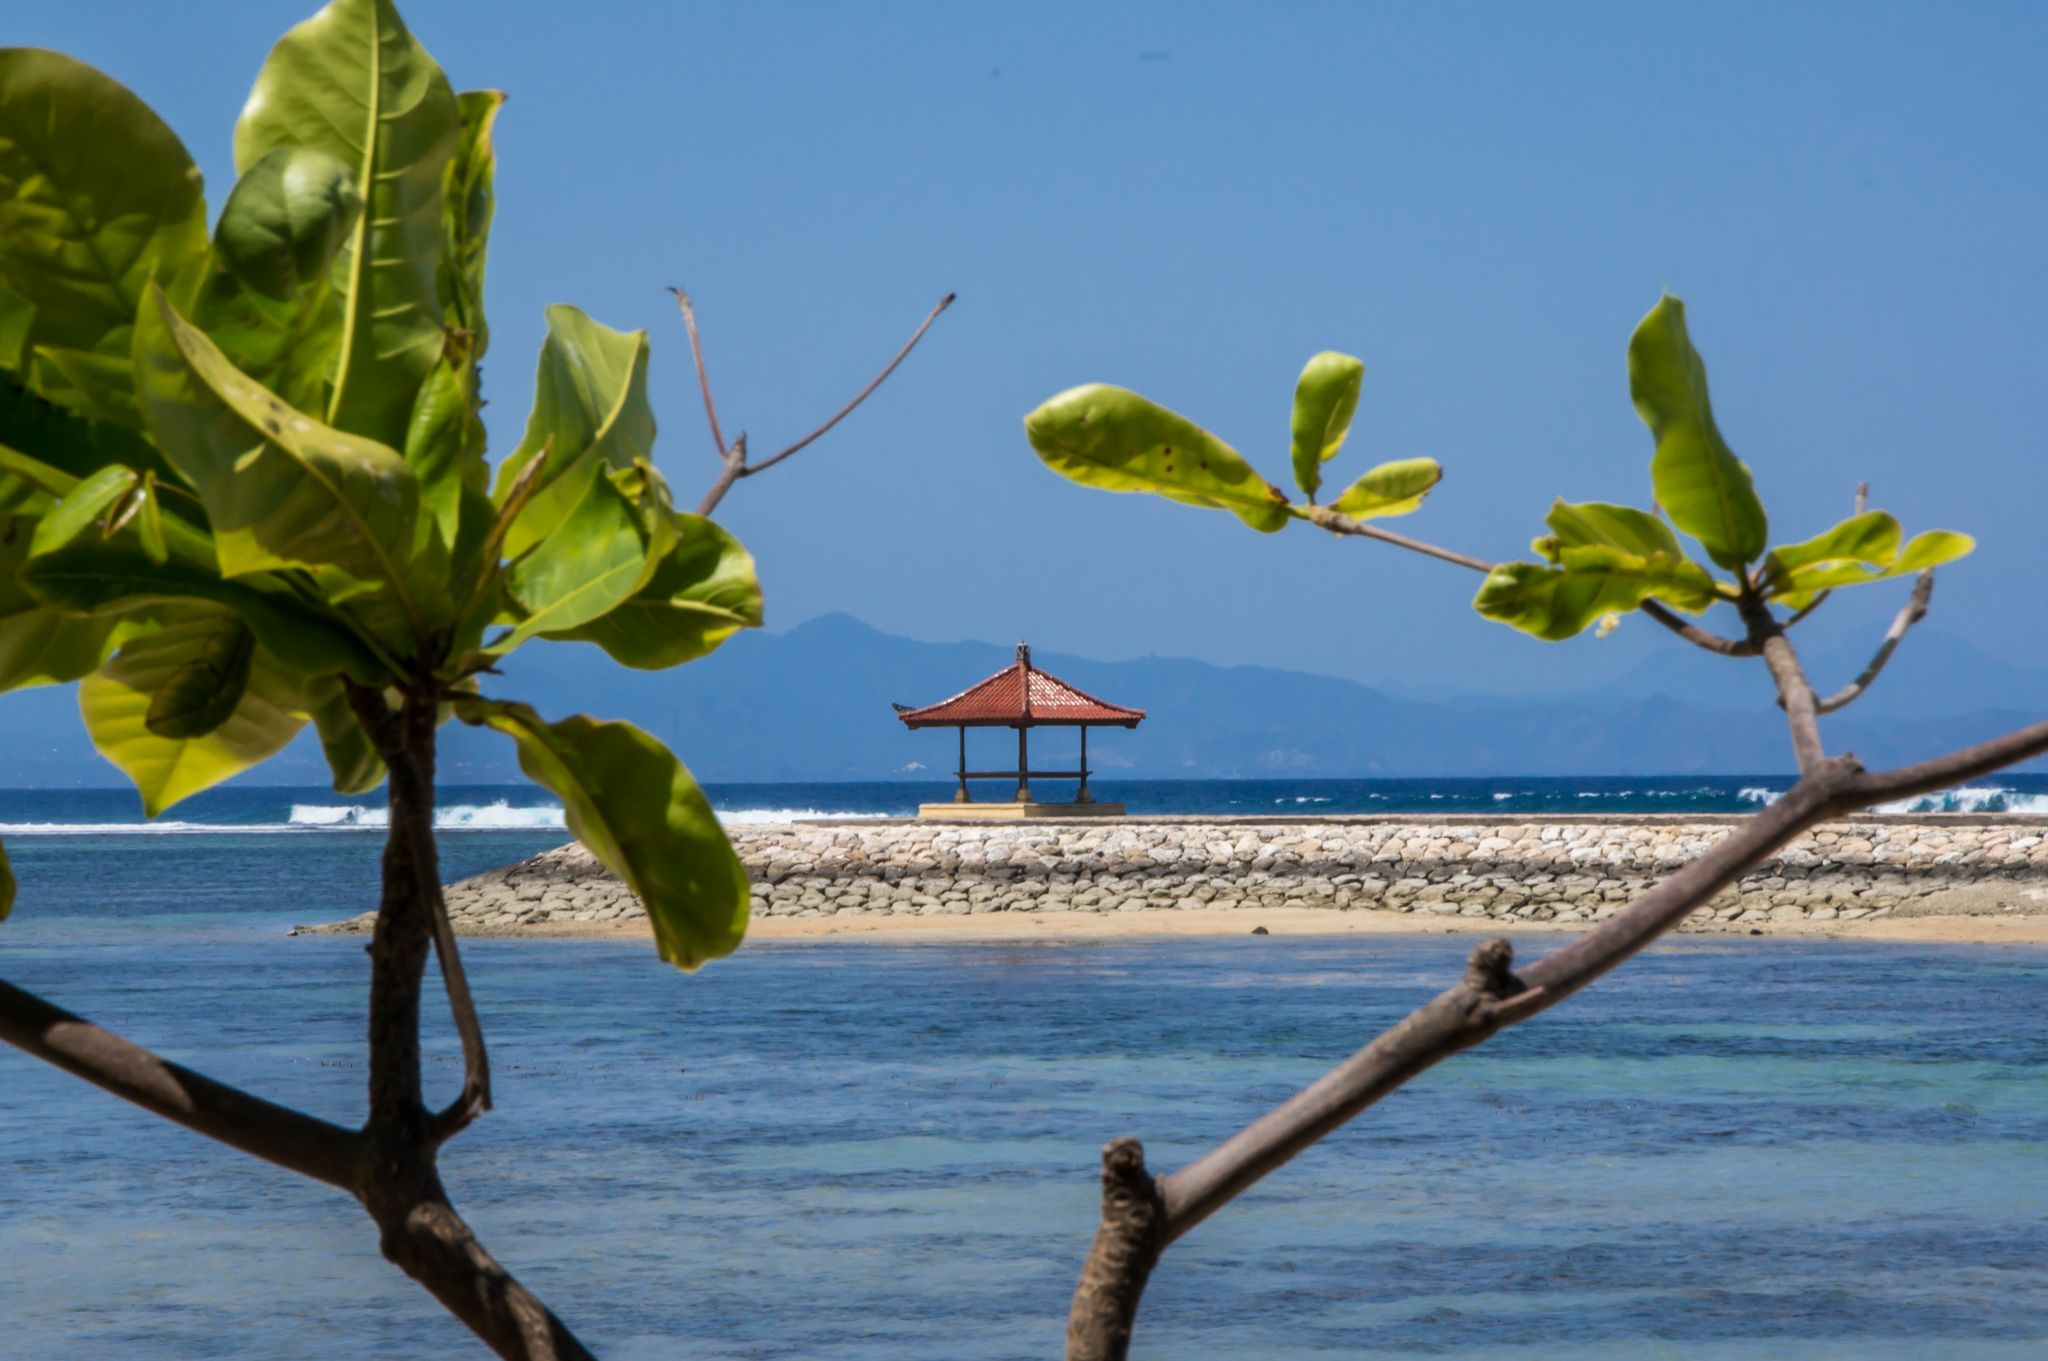 Beach of Sanur, Bali, Indonesia